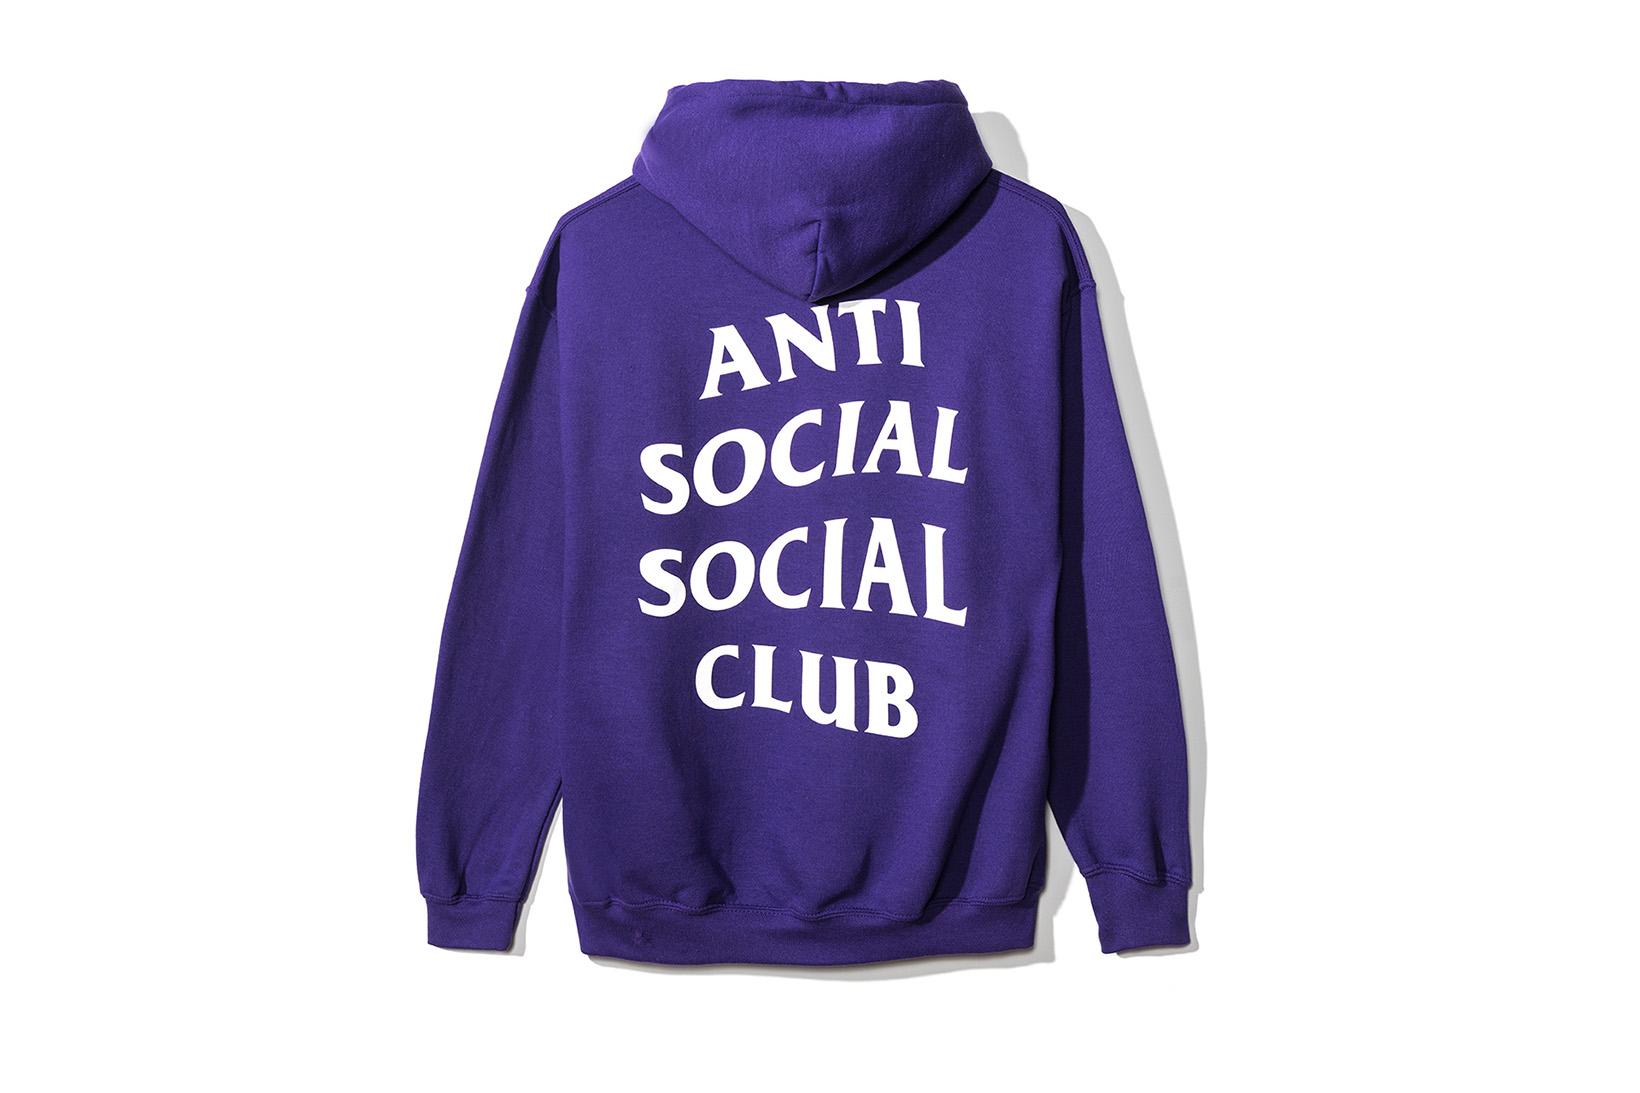 Anti Social Social Club 2017 Spring Summer - 3744336